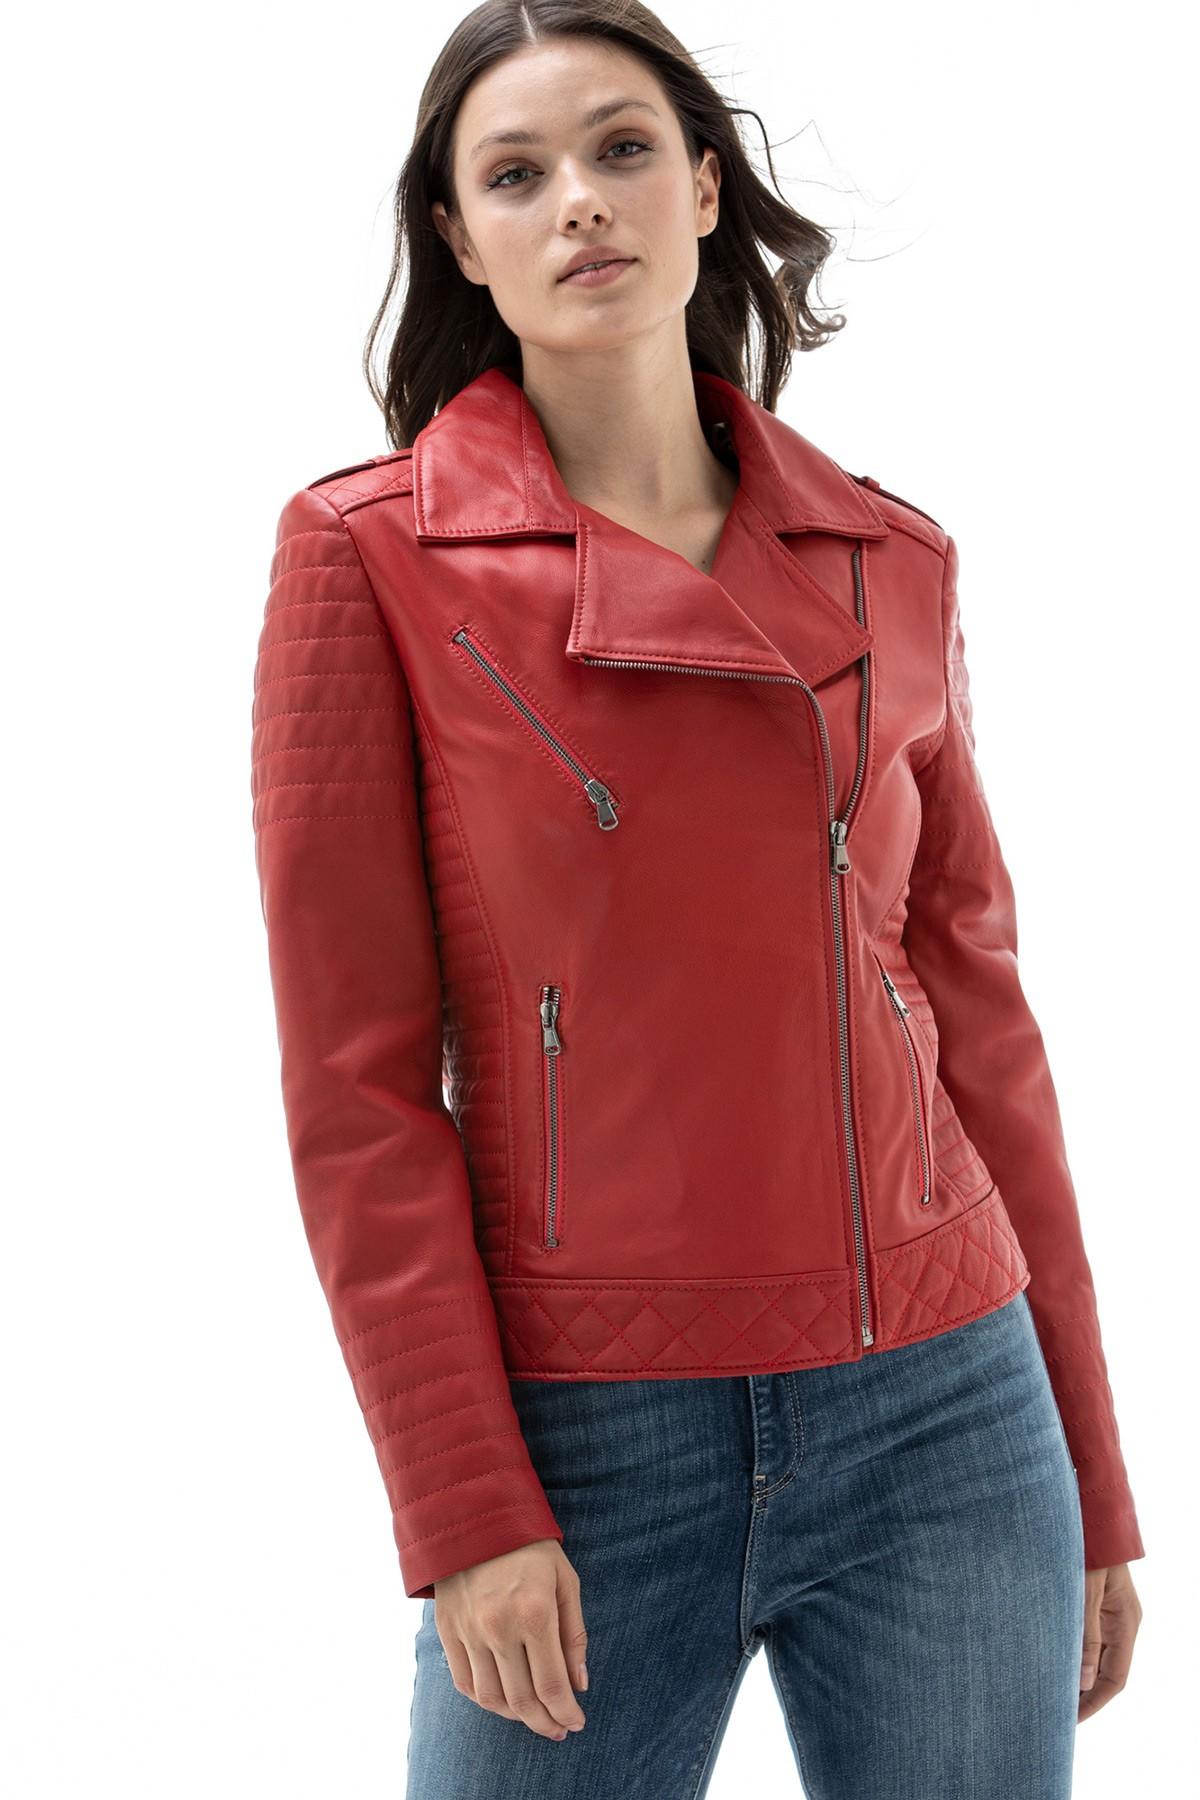 Winter Jacket Leather